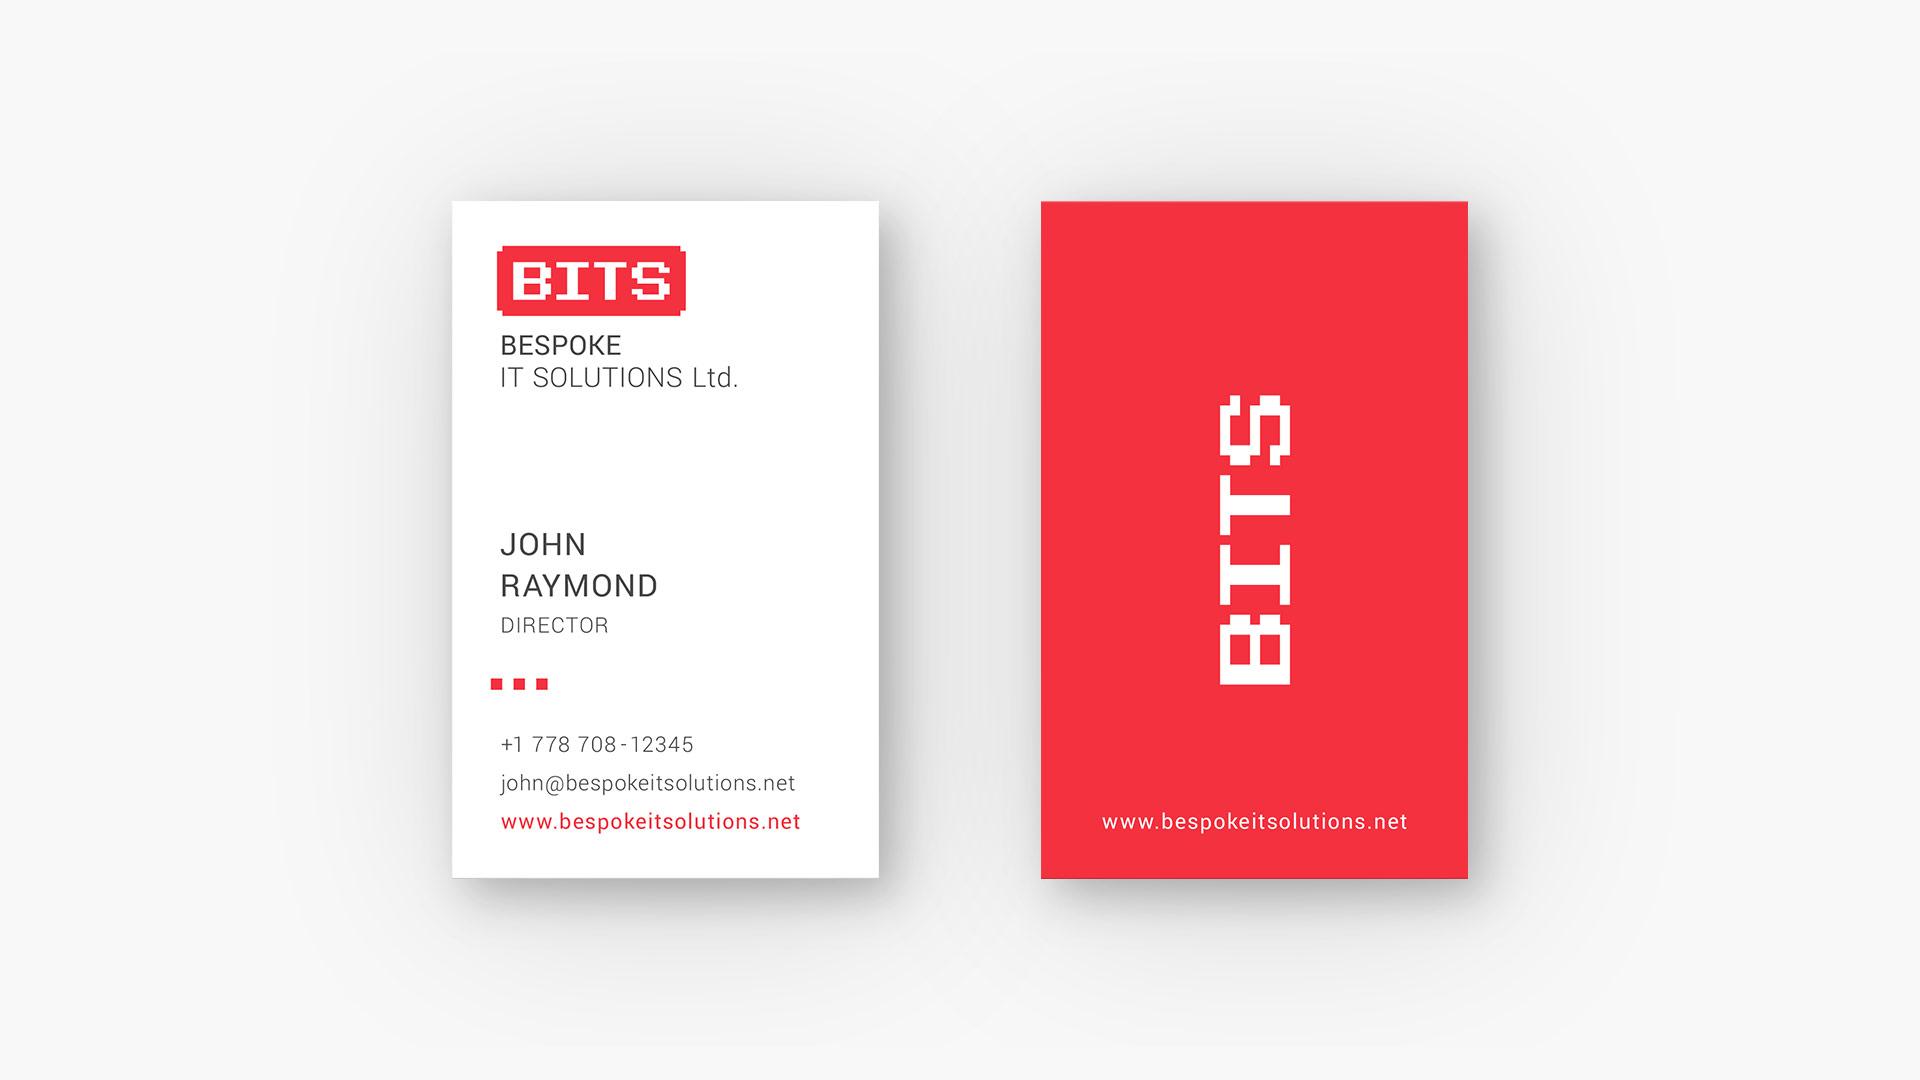 Bespoke IT Solutions Ltd. | Business Card Design | Branding By Artjom Meister | Art-mas.com